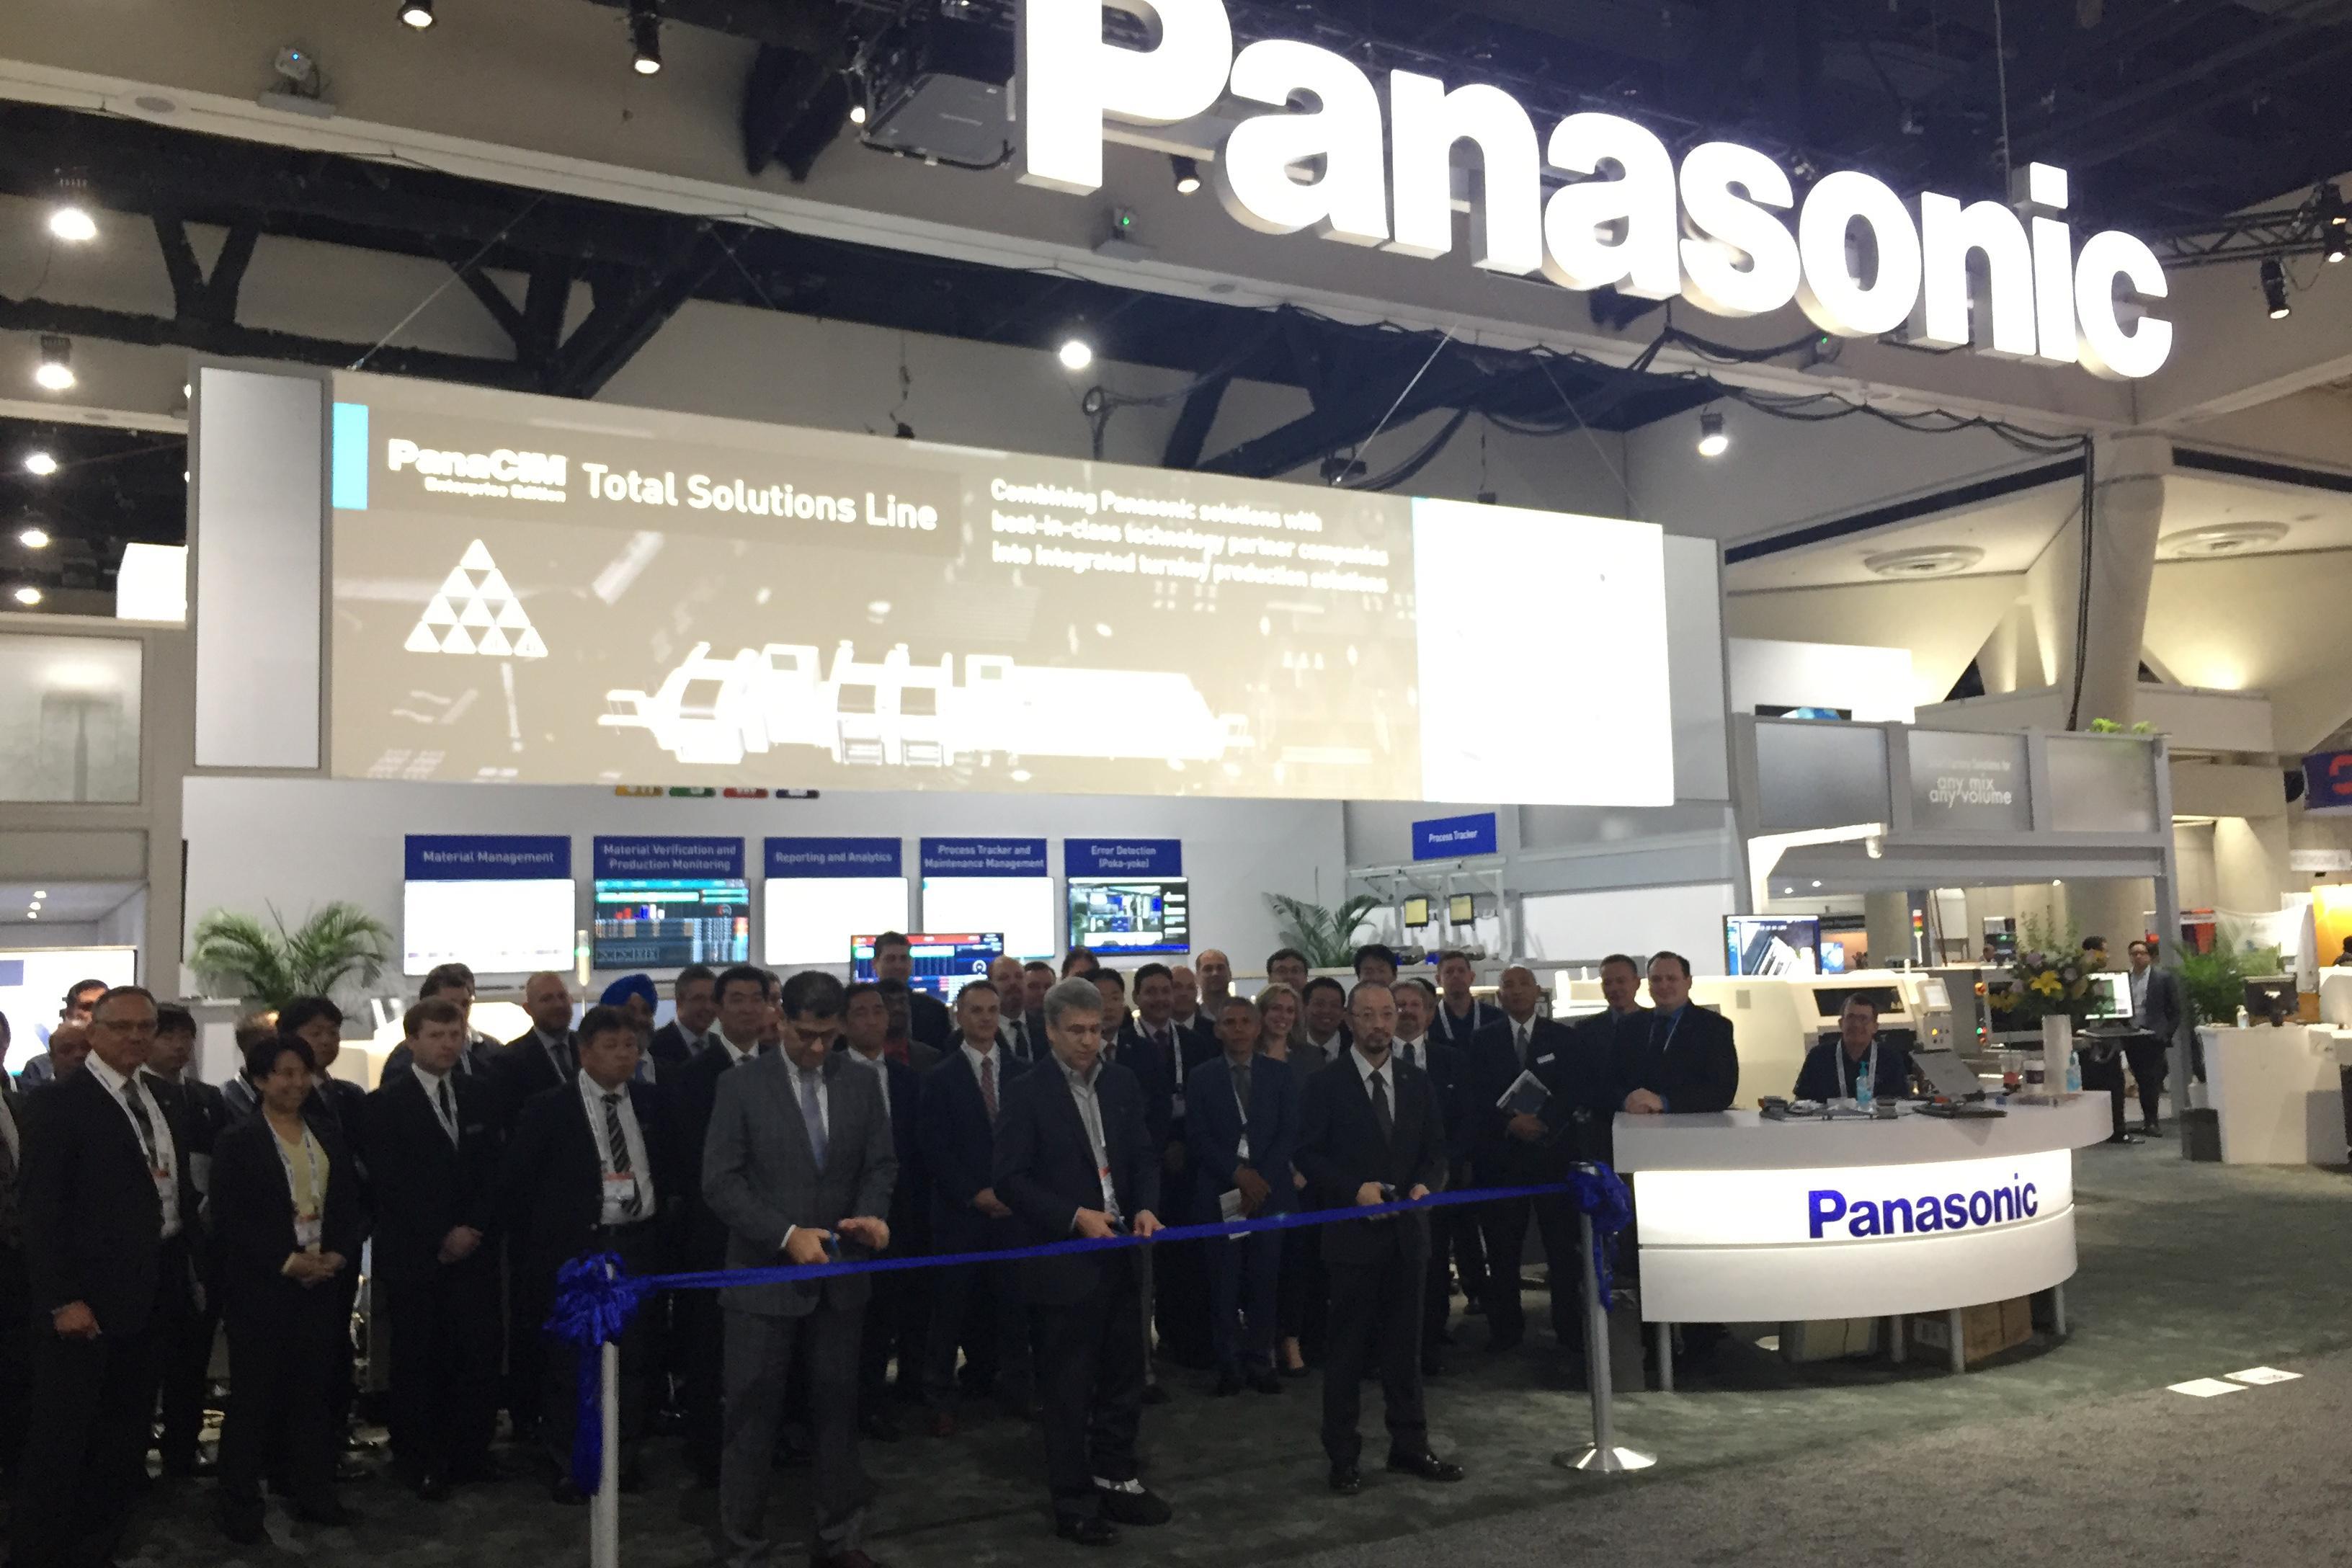 photo: Panasonic's ribbon-cutting ceremony at APEX 2018